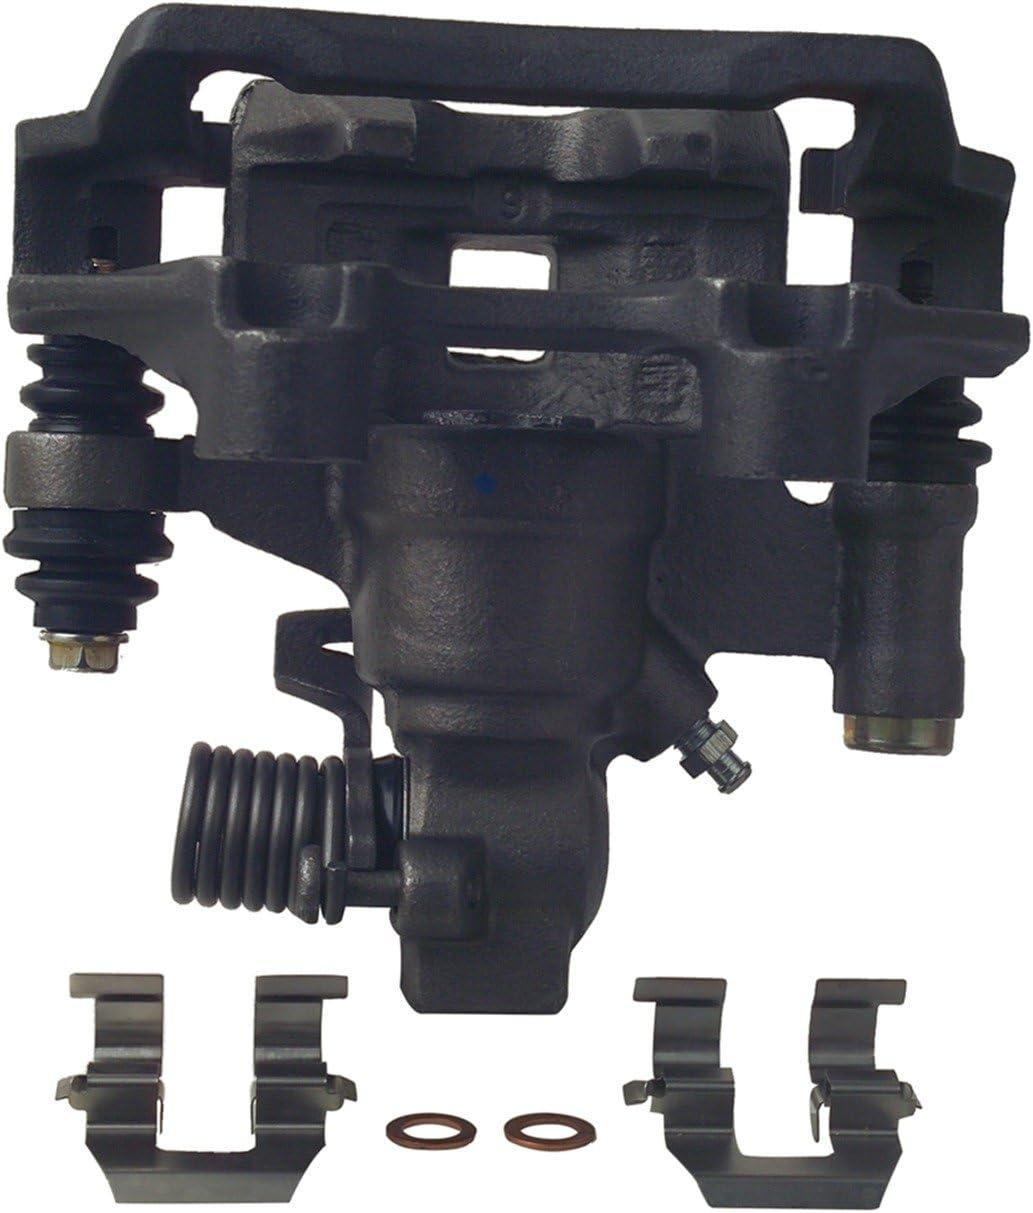 Unloaded Brake Caliper A1 Cardone Cardone 18-B4392A Remanufactured Domestic Friction Ready